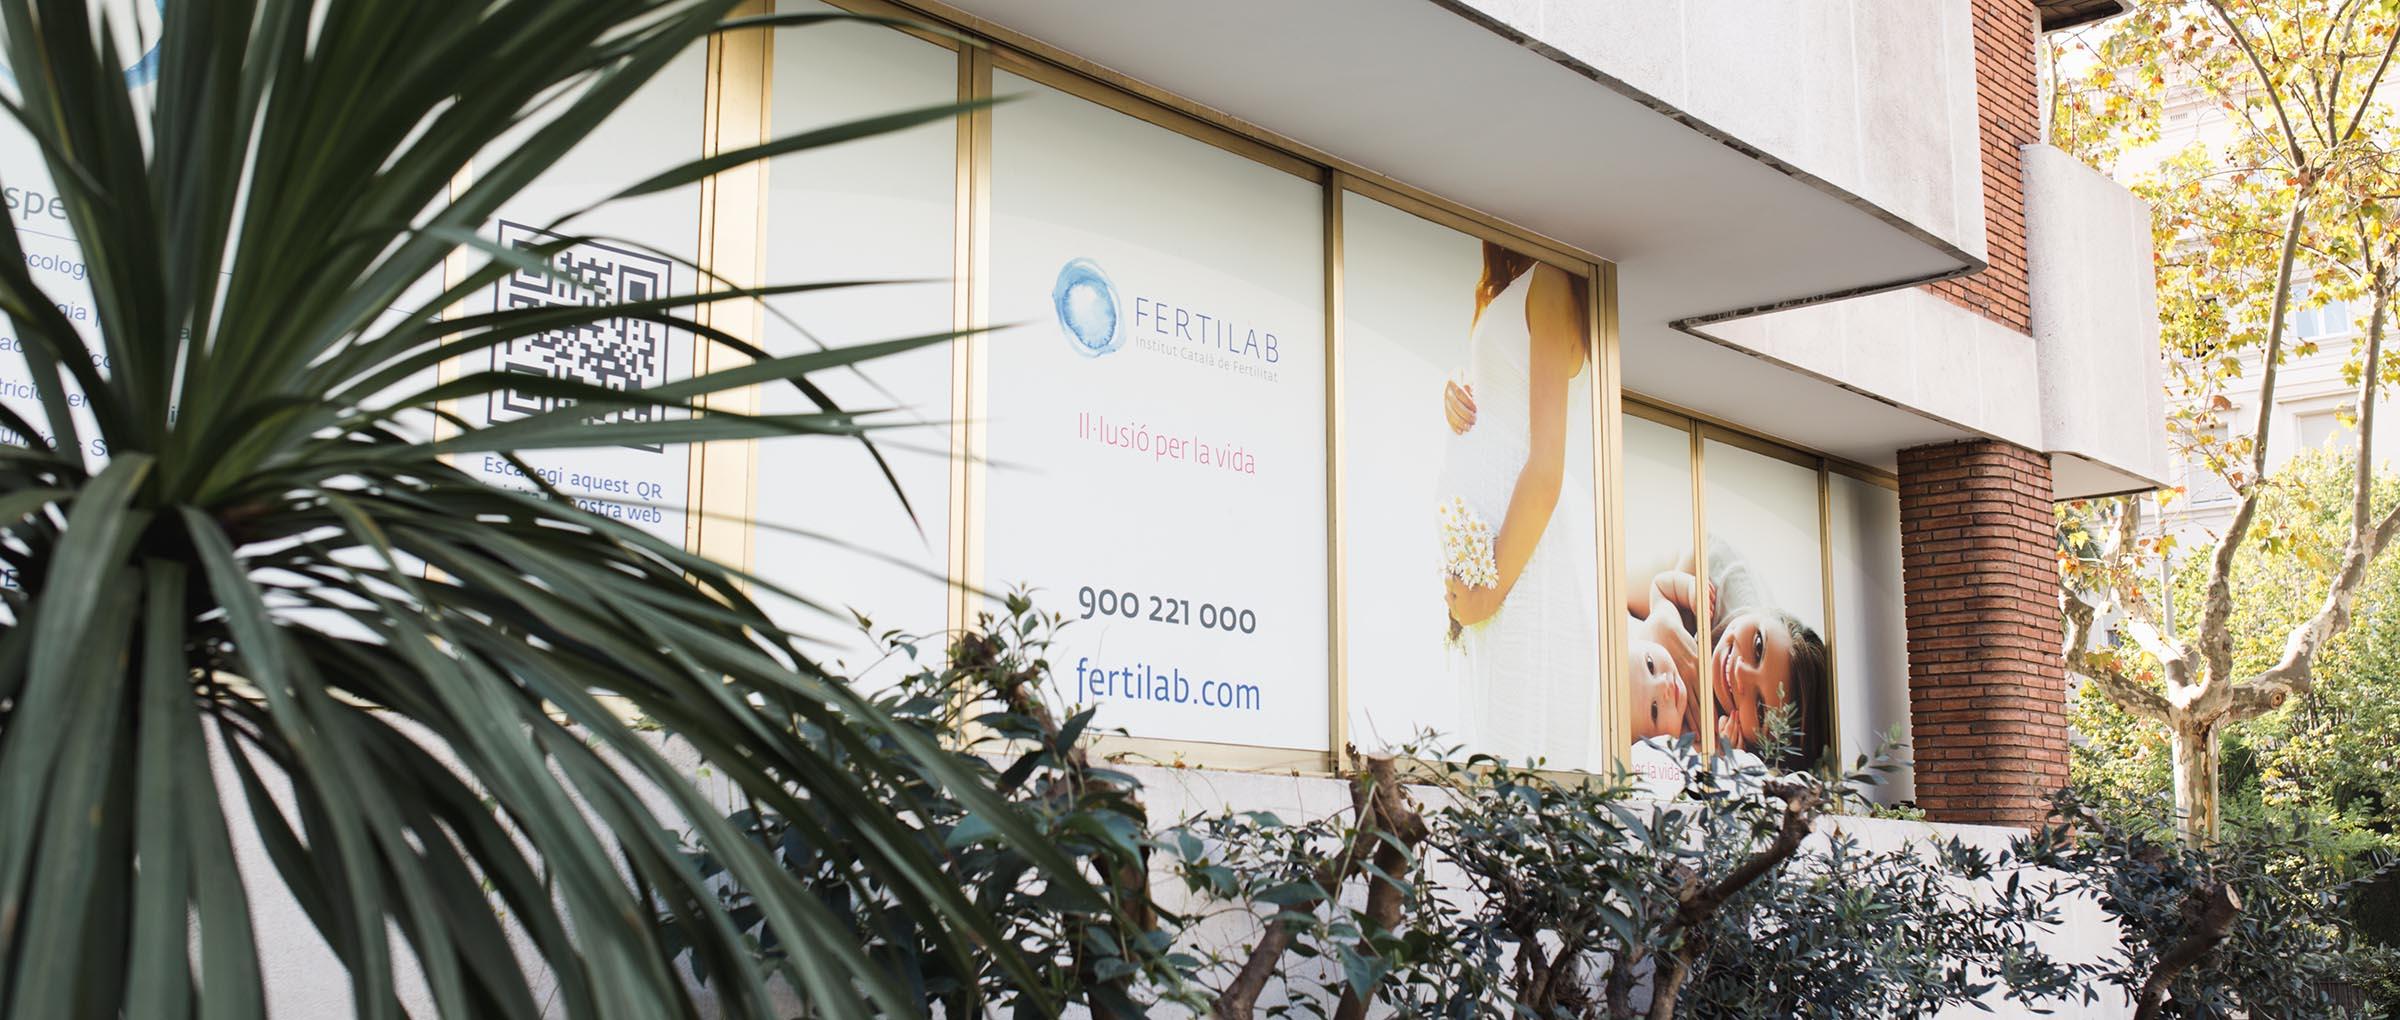 Fertilab building